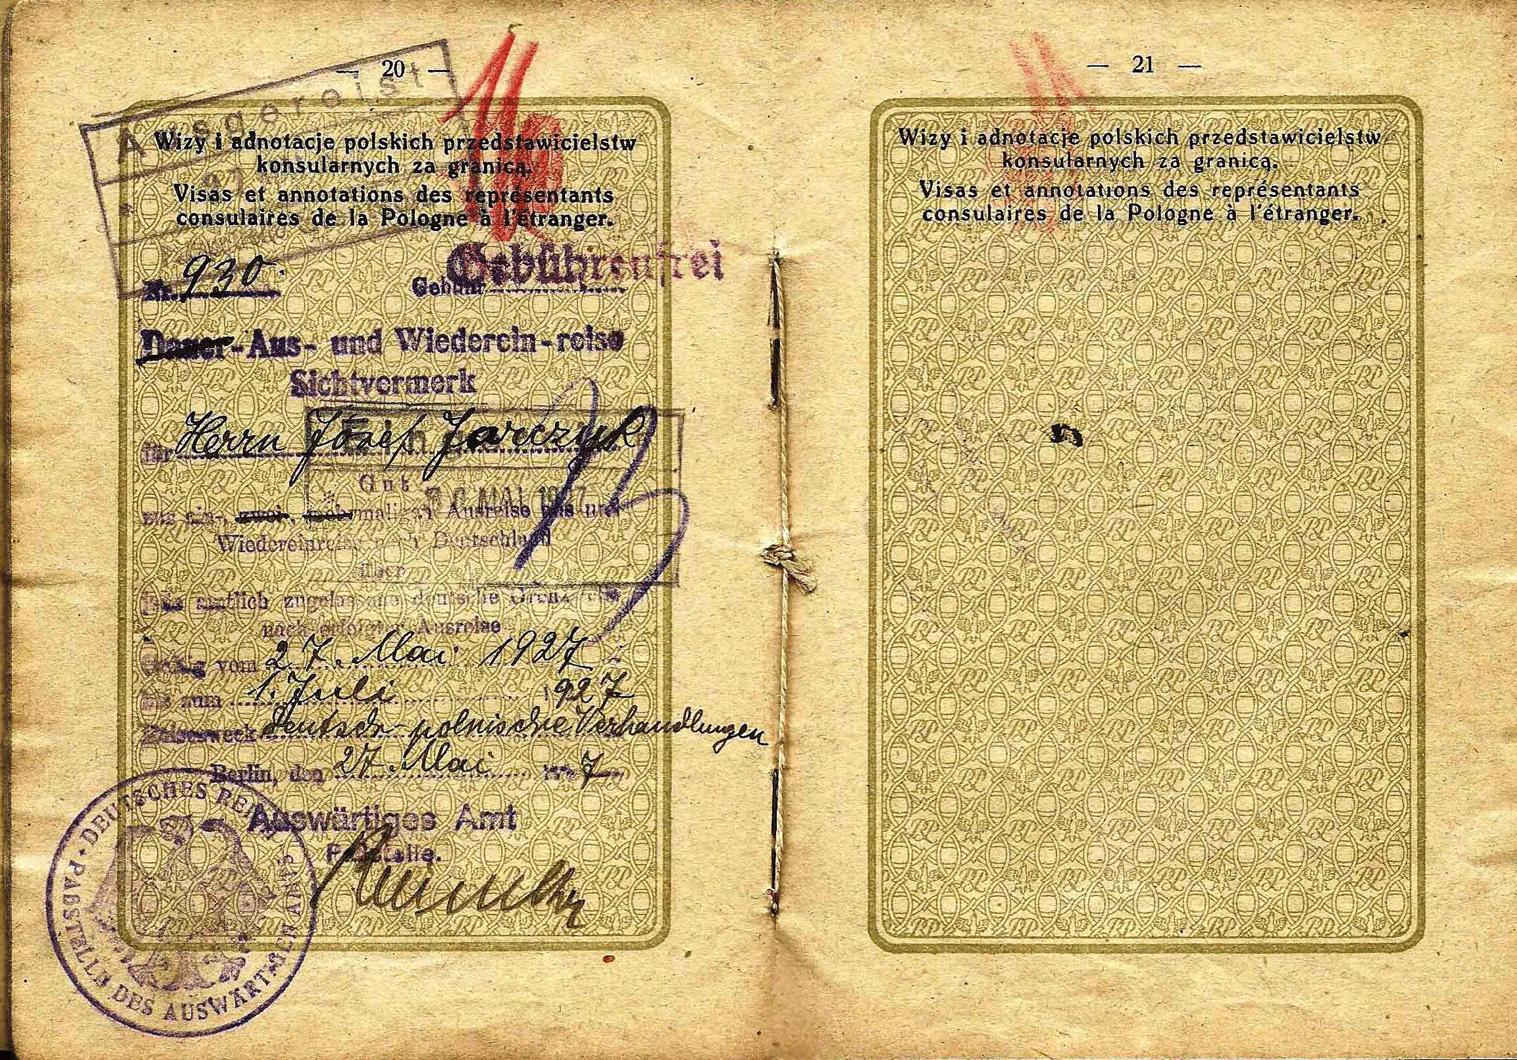 old Polish service passport